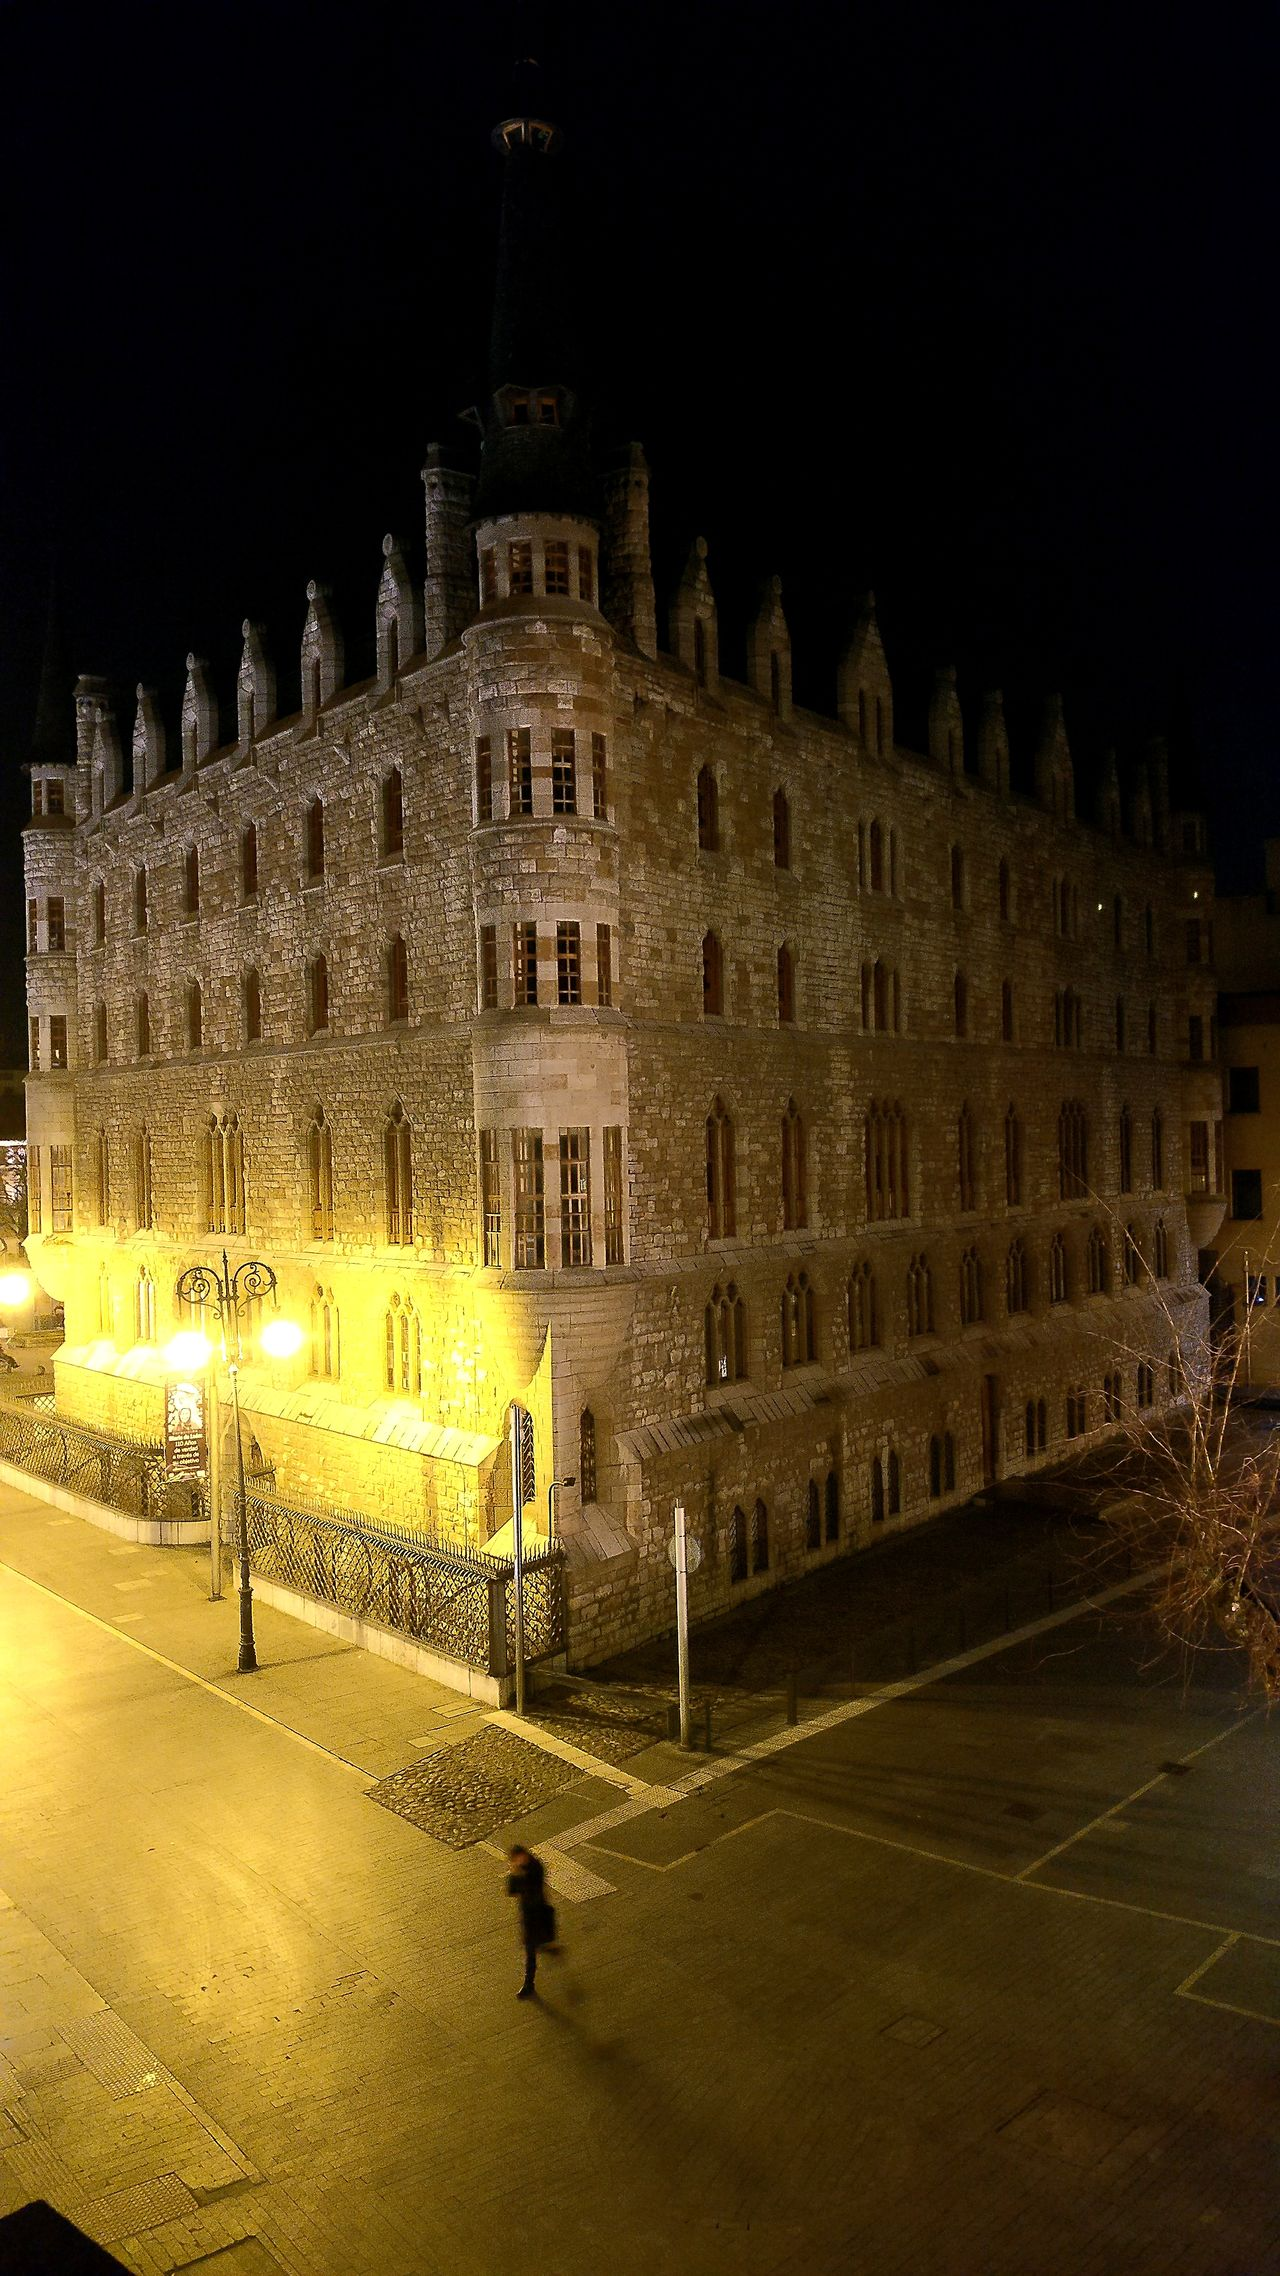 Palacio de Botines Architecture City Night Building Exterior Illuminated LeonEsp  Nightphotography Night Lights